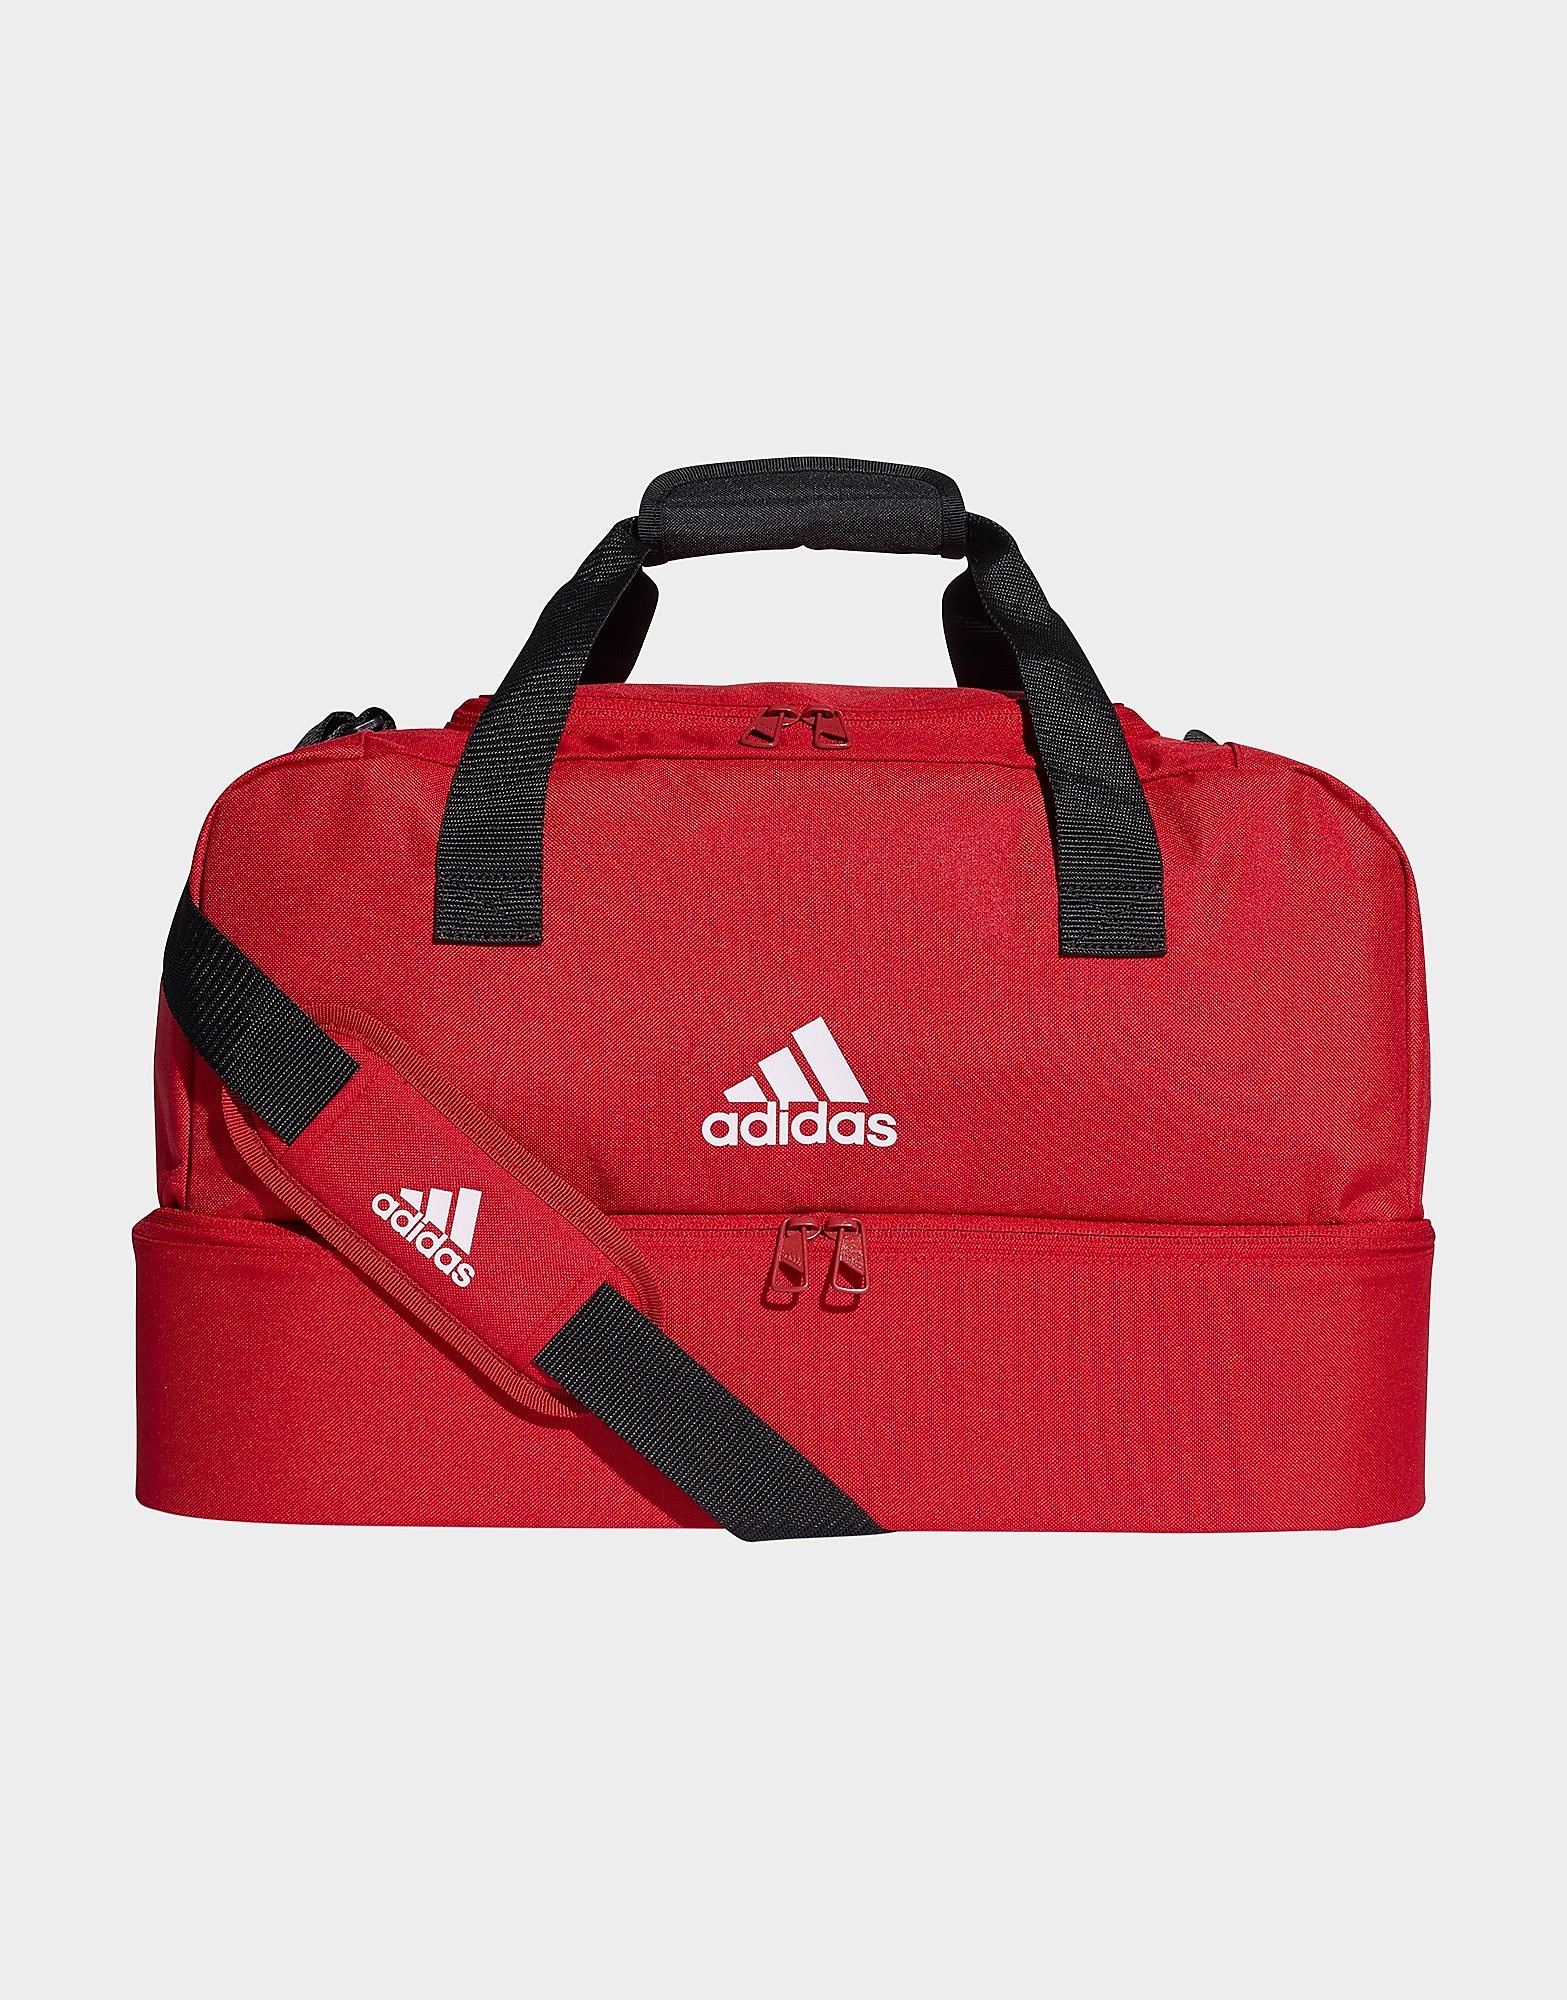 Adidas Bags Jd Sports